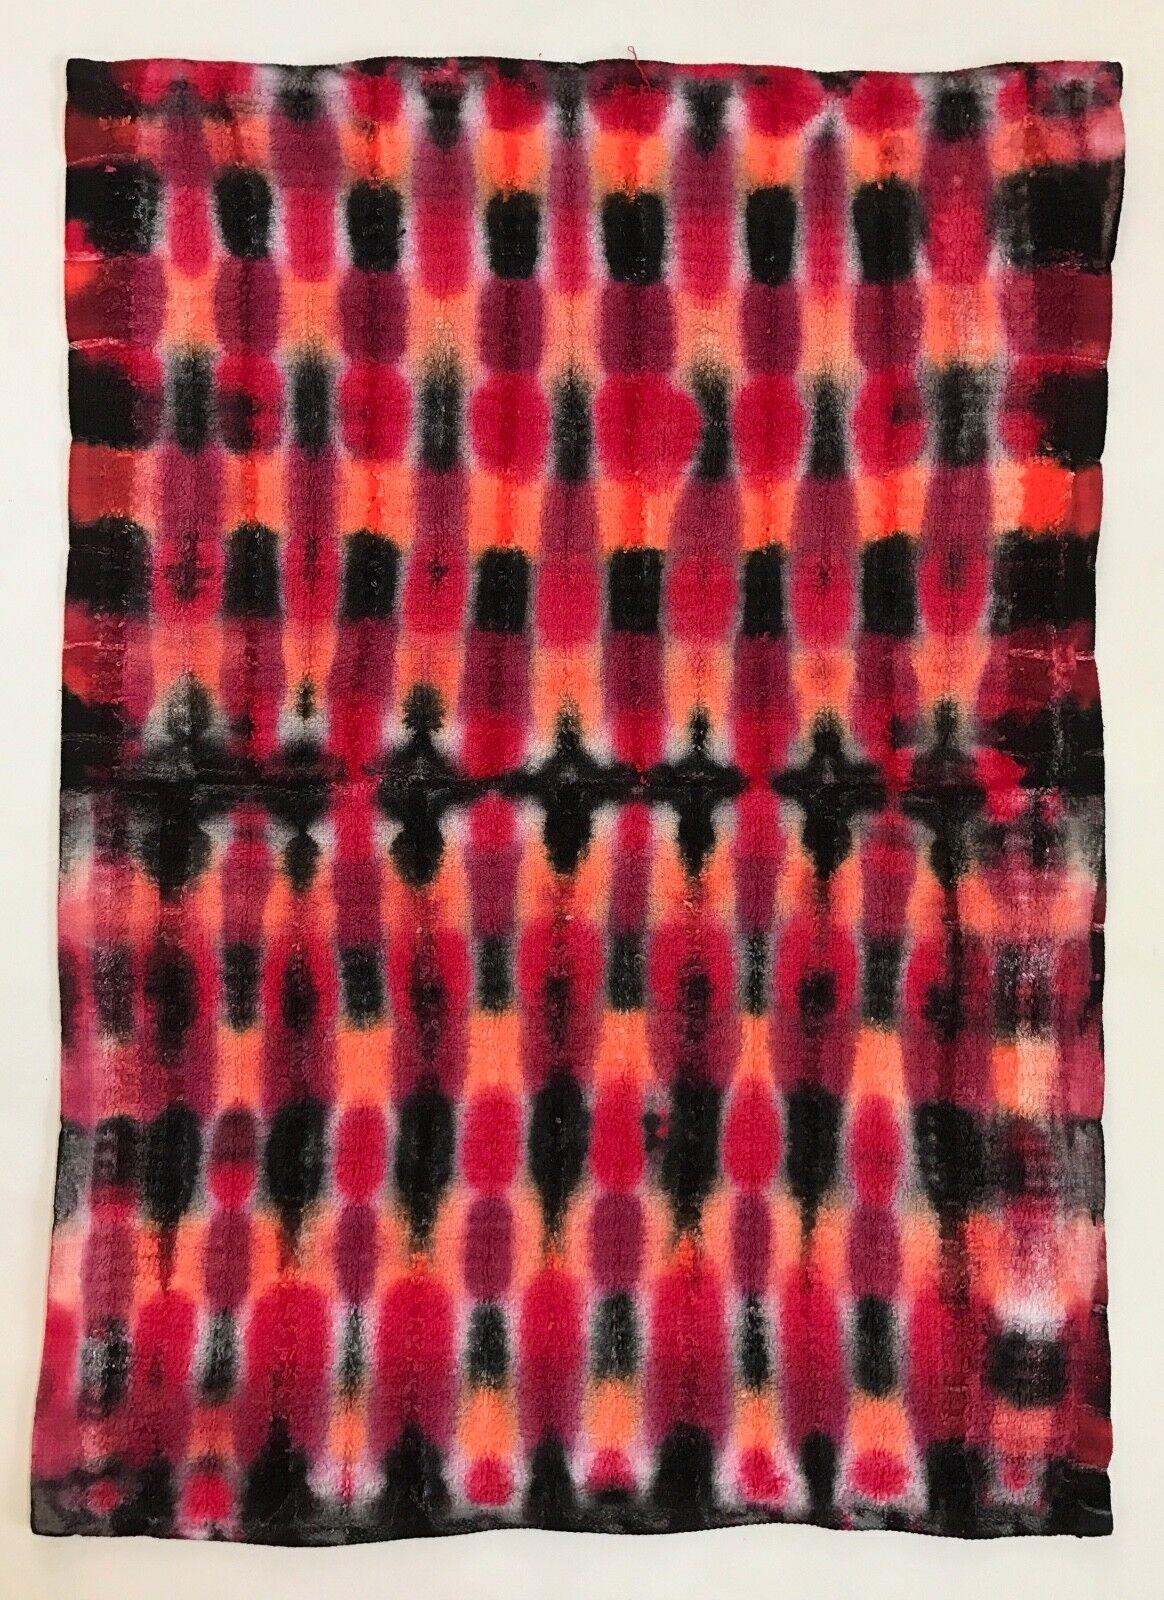 *New* Handmade Tie Dye Red Lava Lamp Washcloth Hand, Bath Towel, Single or Set